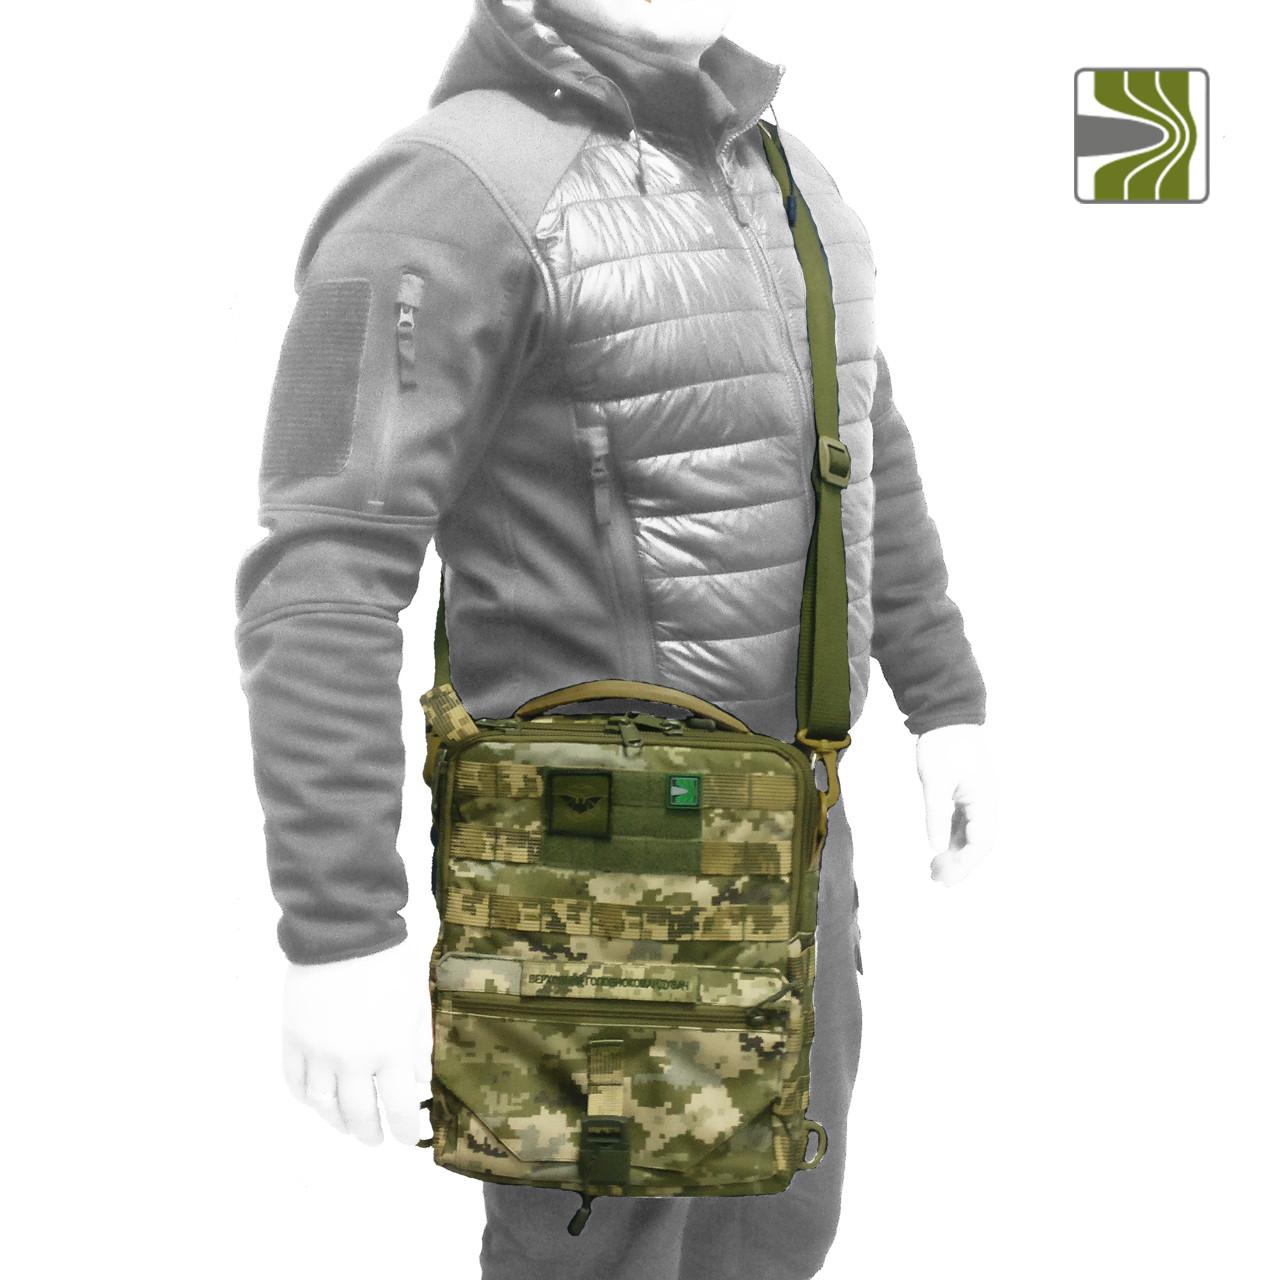 Тактичний планшет (тактична сумка планшет), колір ММ-14 (український піксель / українська цифра)